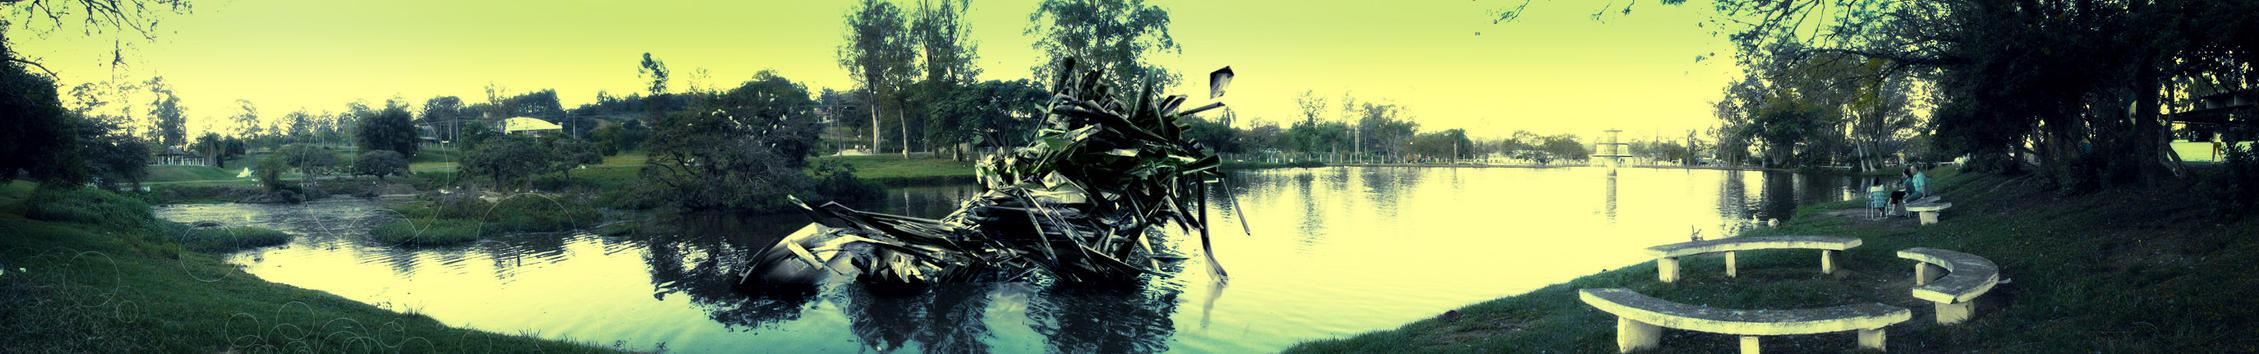 Lake by NothingnessLives